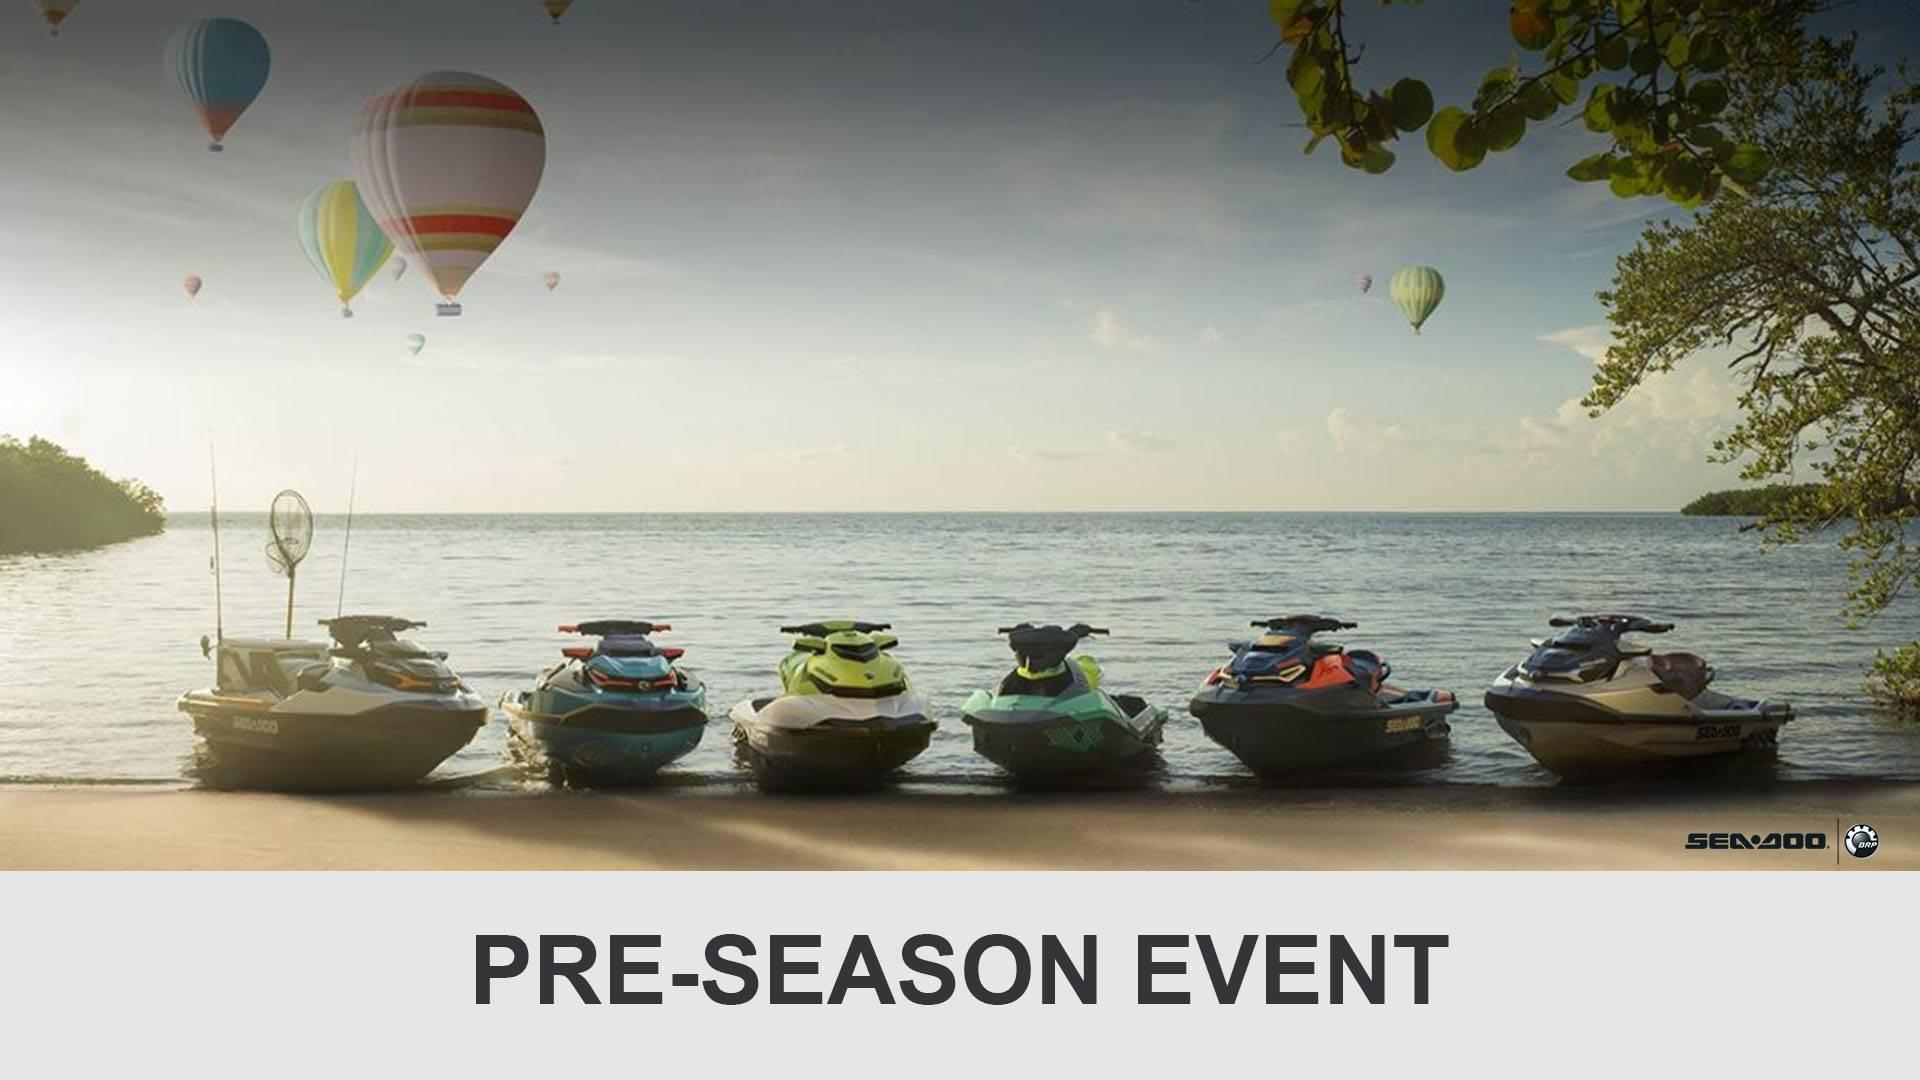 Sea-Doo - Pre-Season Event